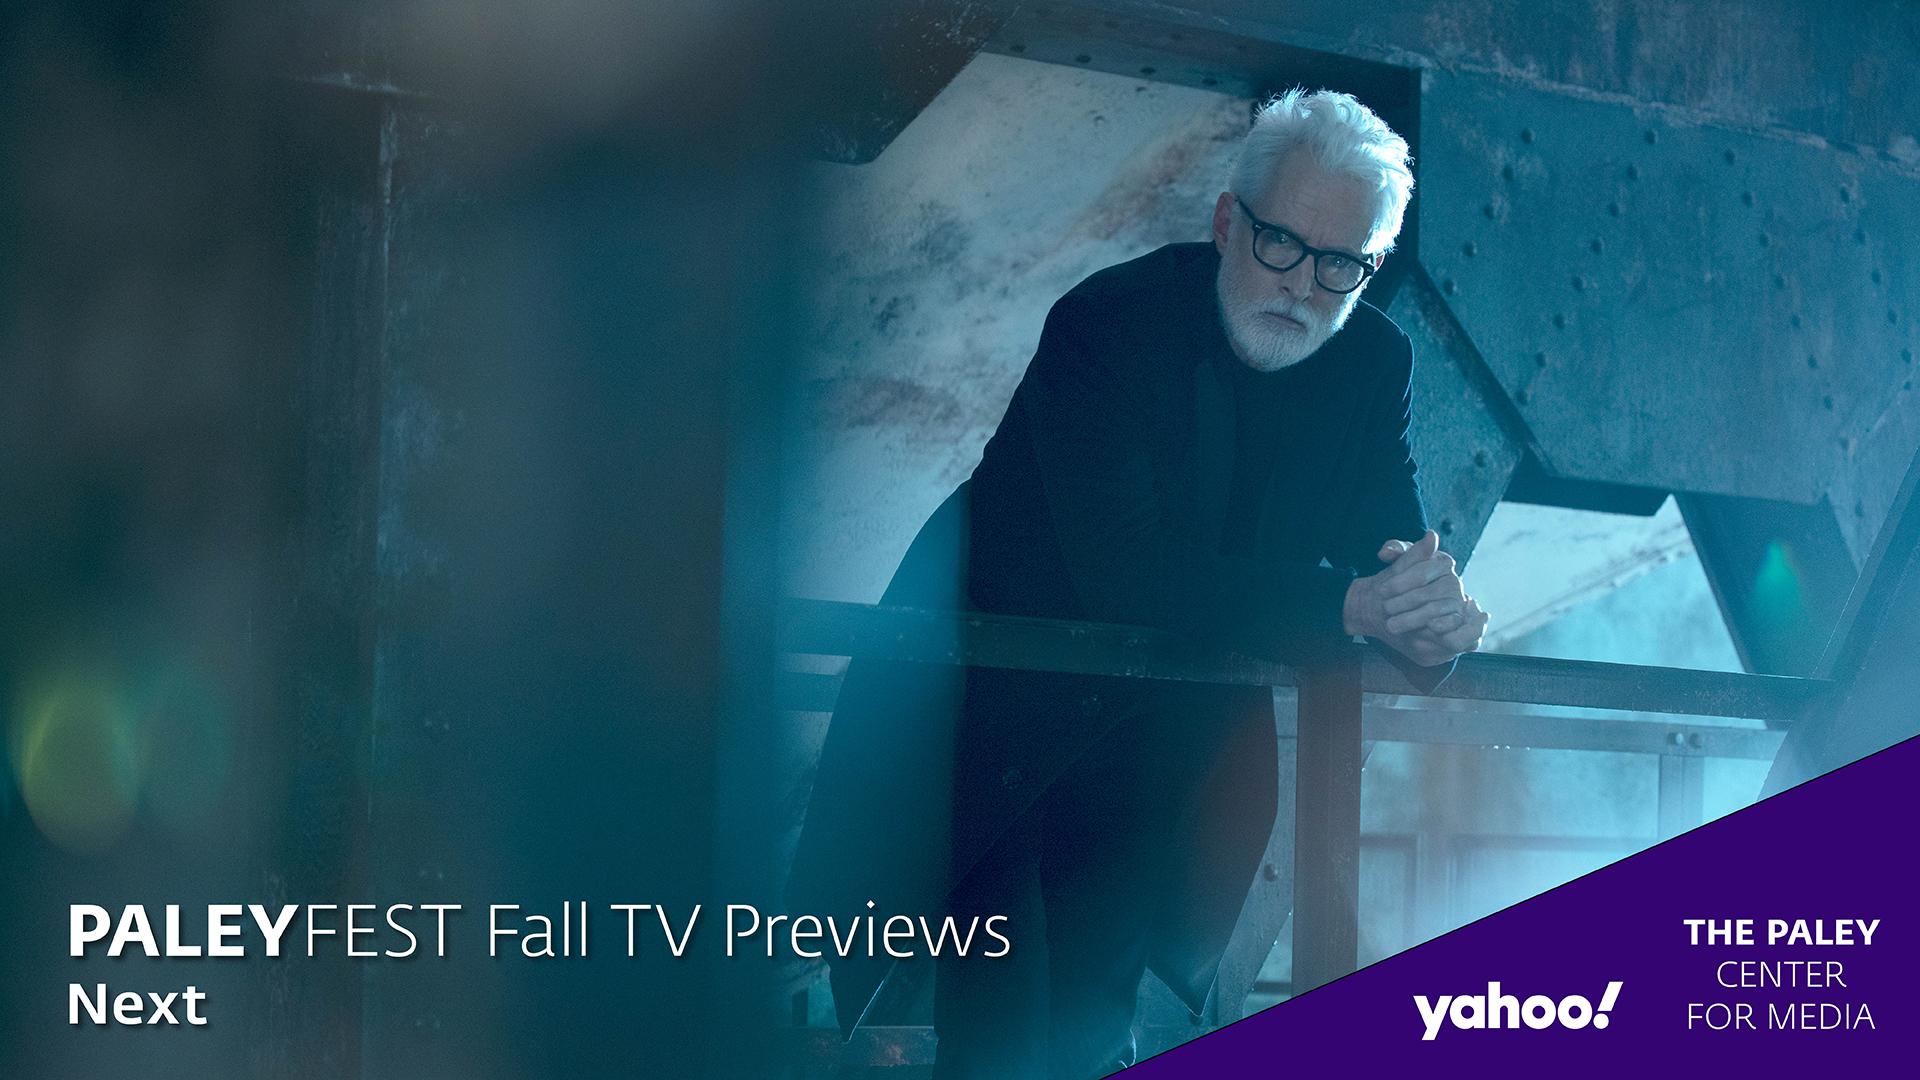 Next at PaleyFest Fall TV Previews 2020